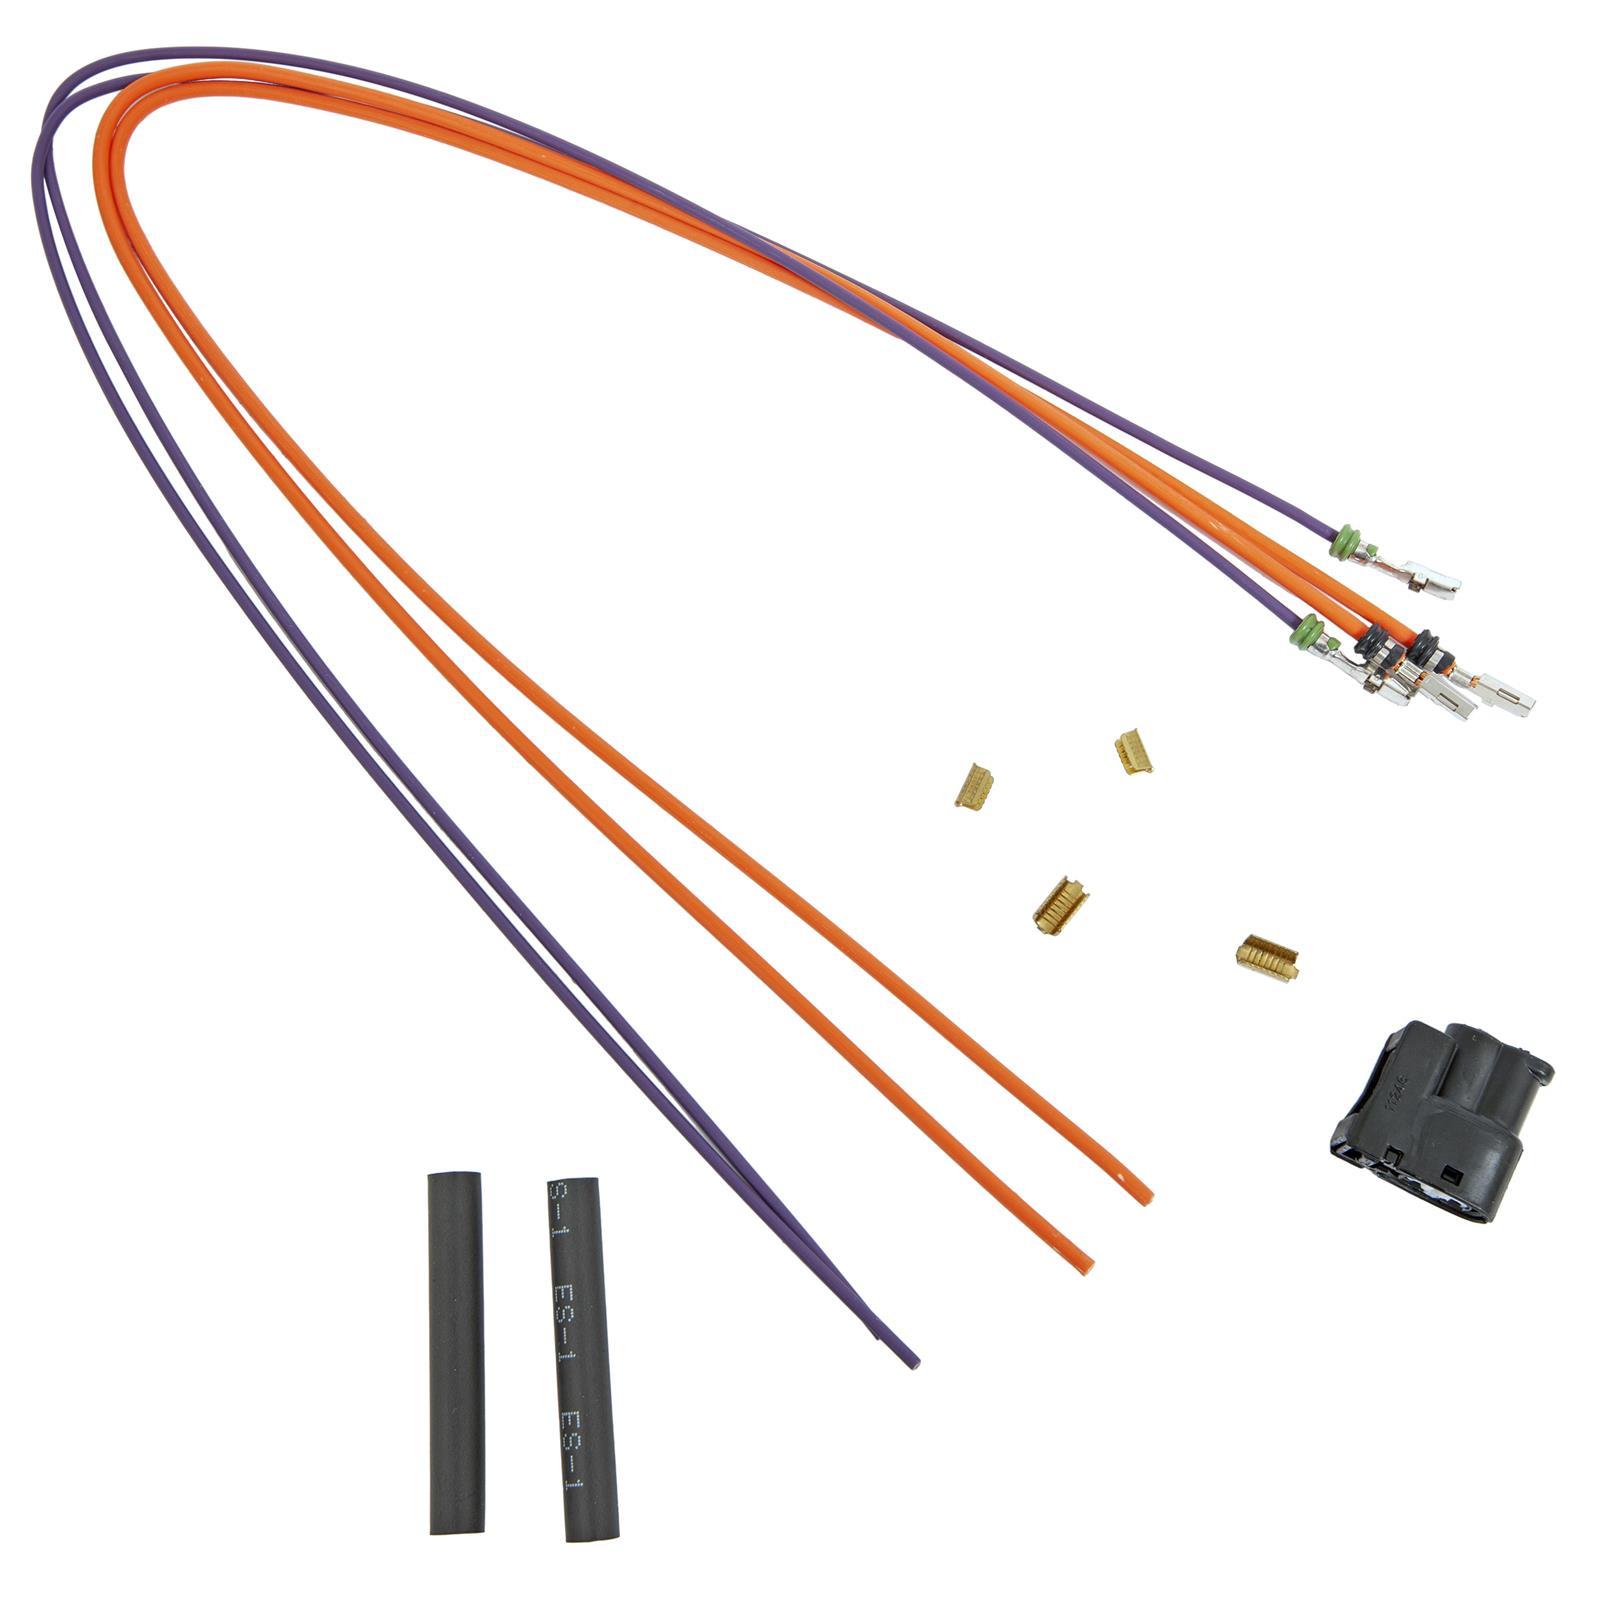 Exterior Accessories Wiring eledenimport.com Genuine Chrysler ...